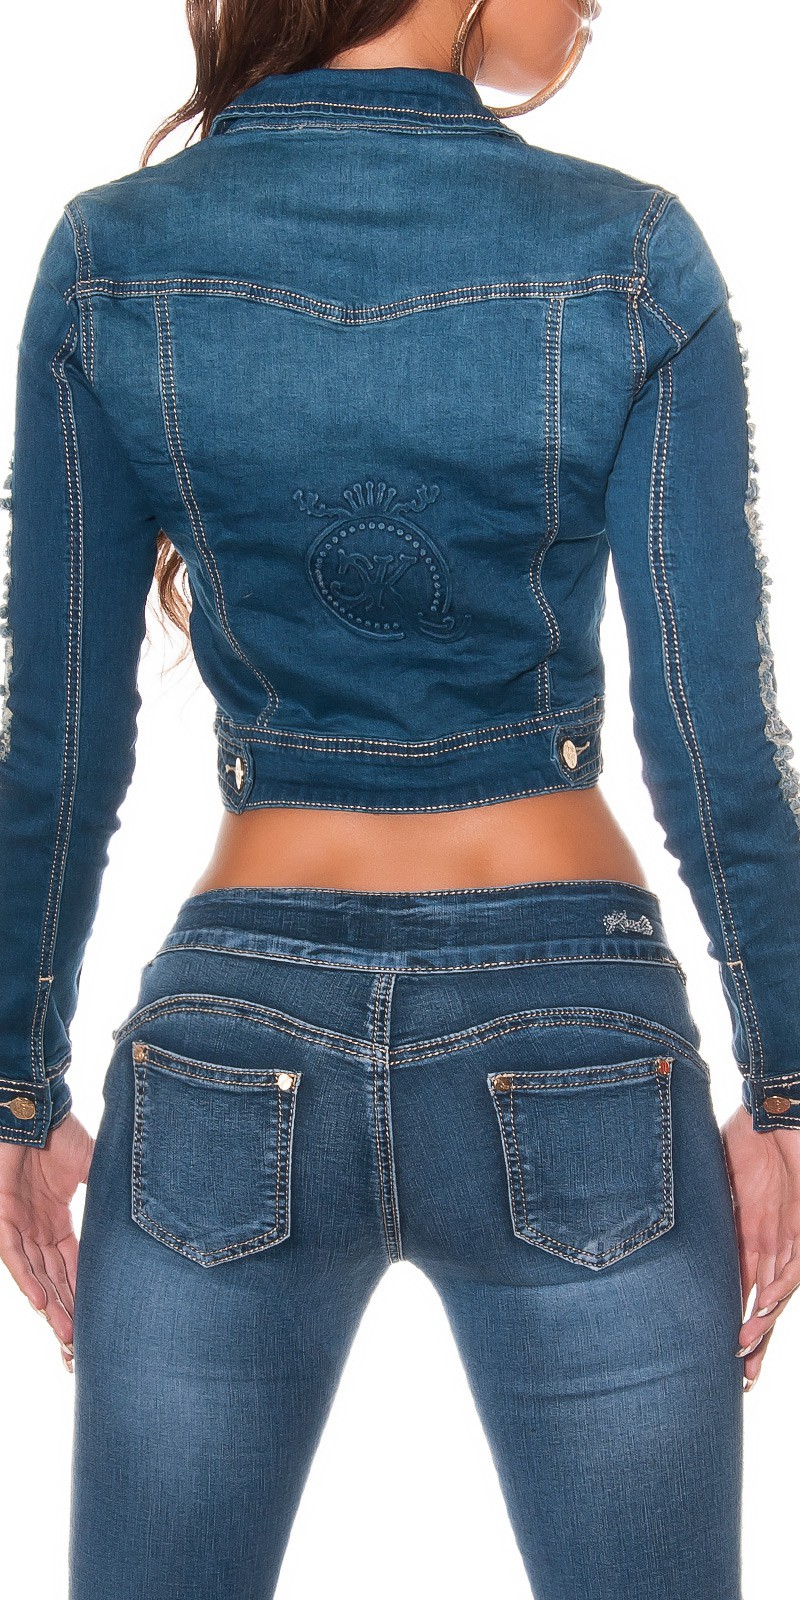 86b8e65bcdbb ooKoucla jeans jacket usedlook  Color JEANSBLUE Size S 0000K600-287 JEANSBLAU 3